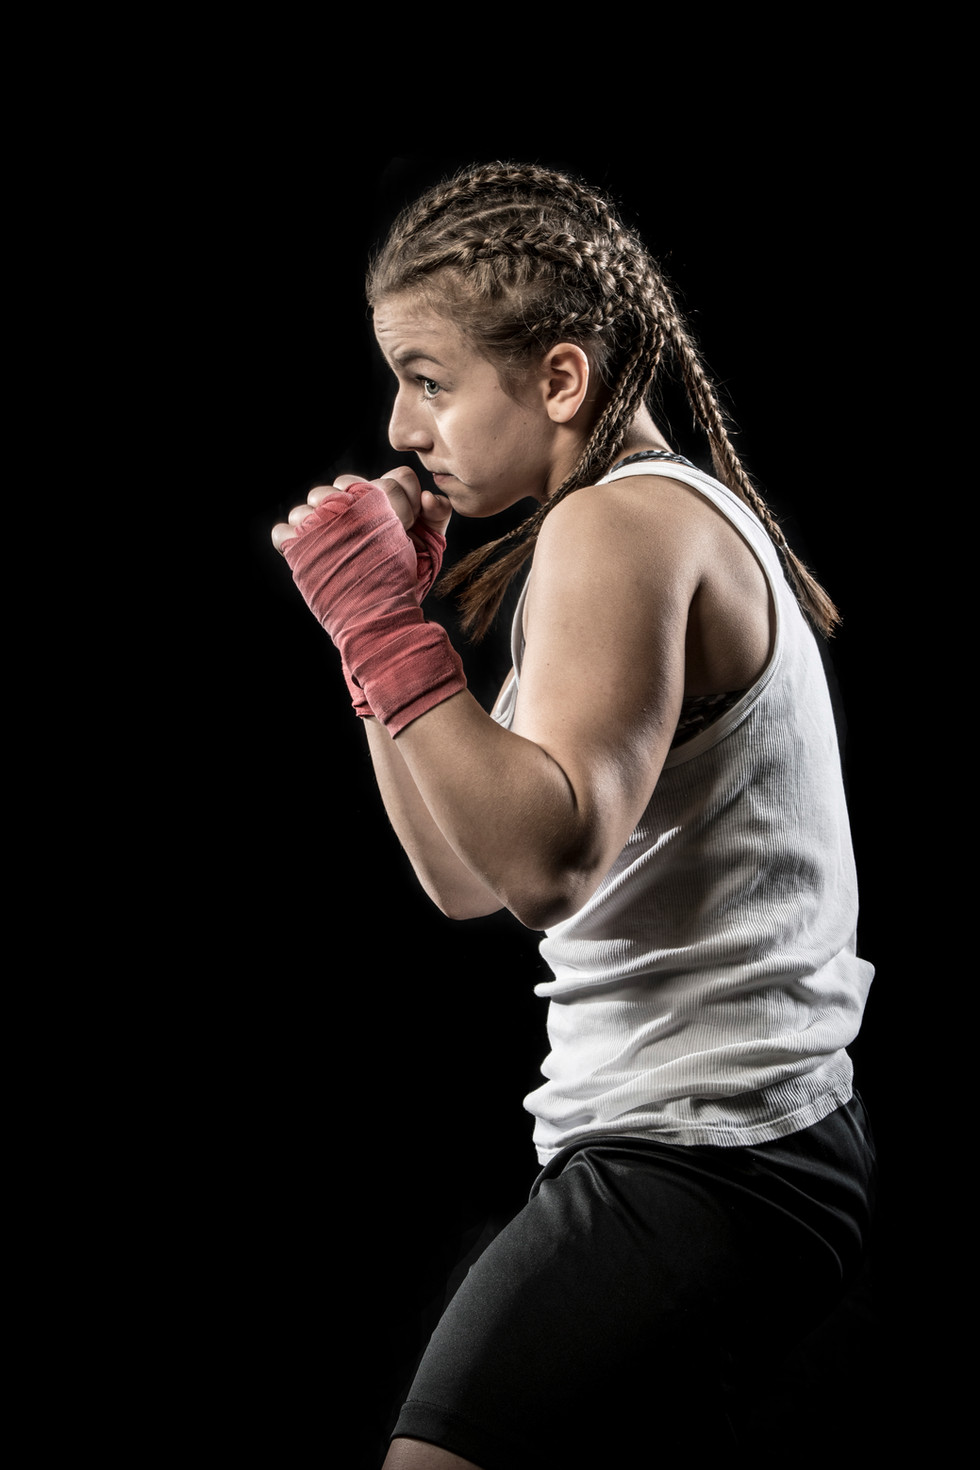 Sportfotografie-Boxen-Boxerin-8.jpg